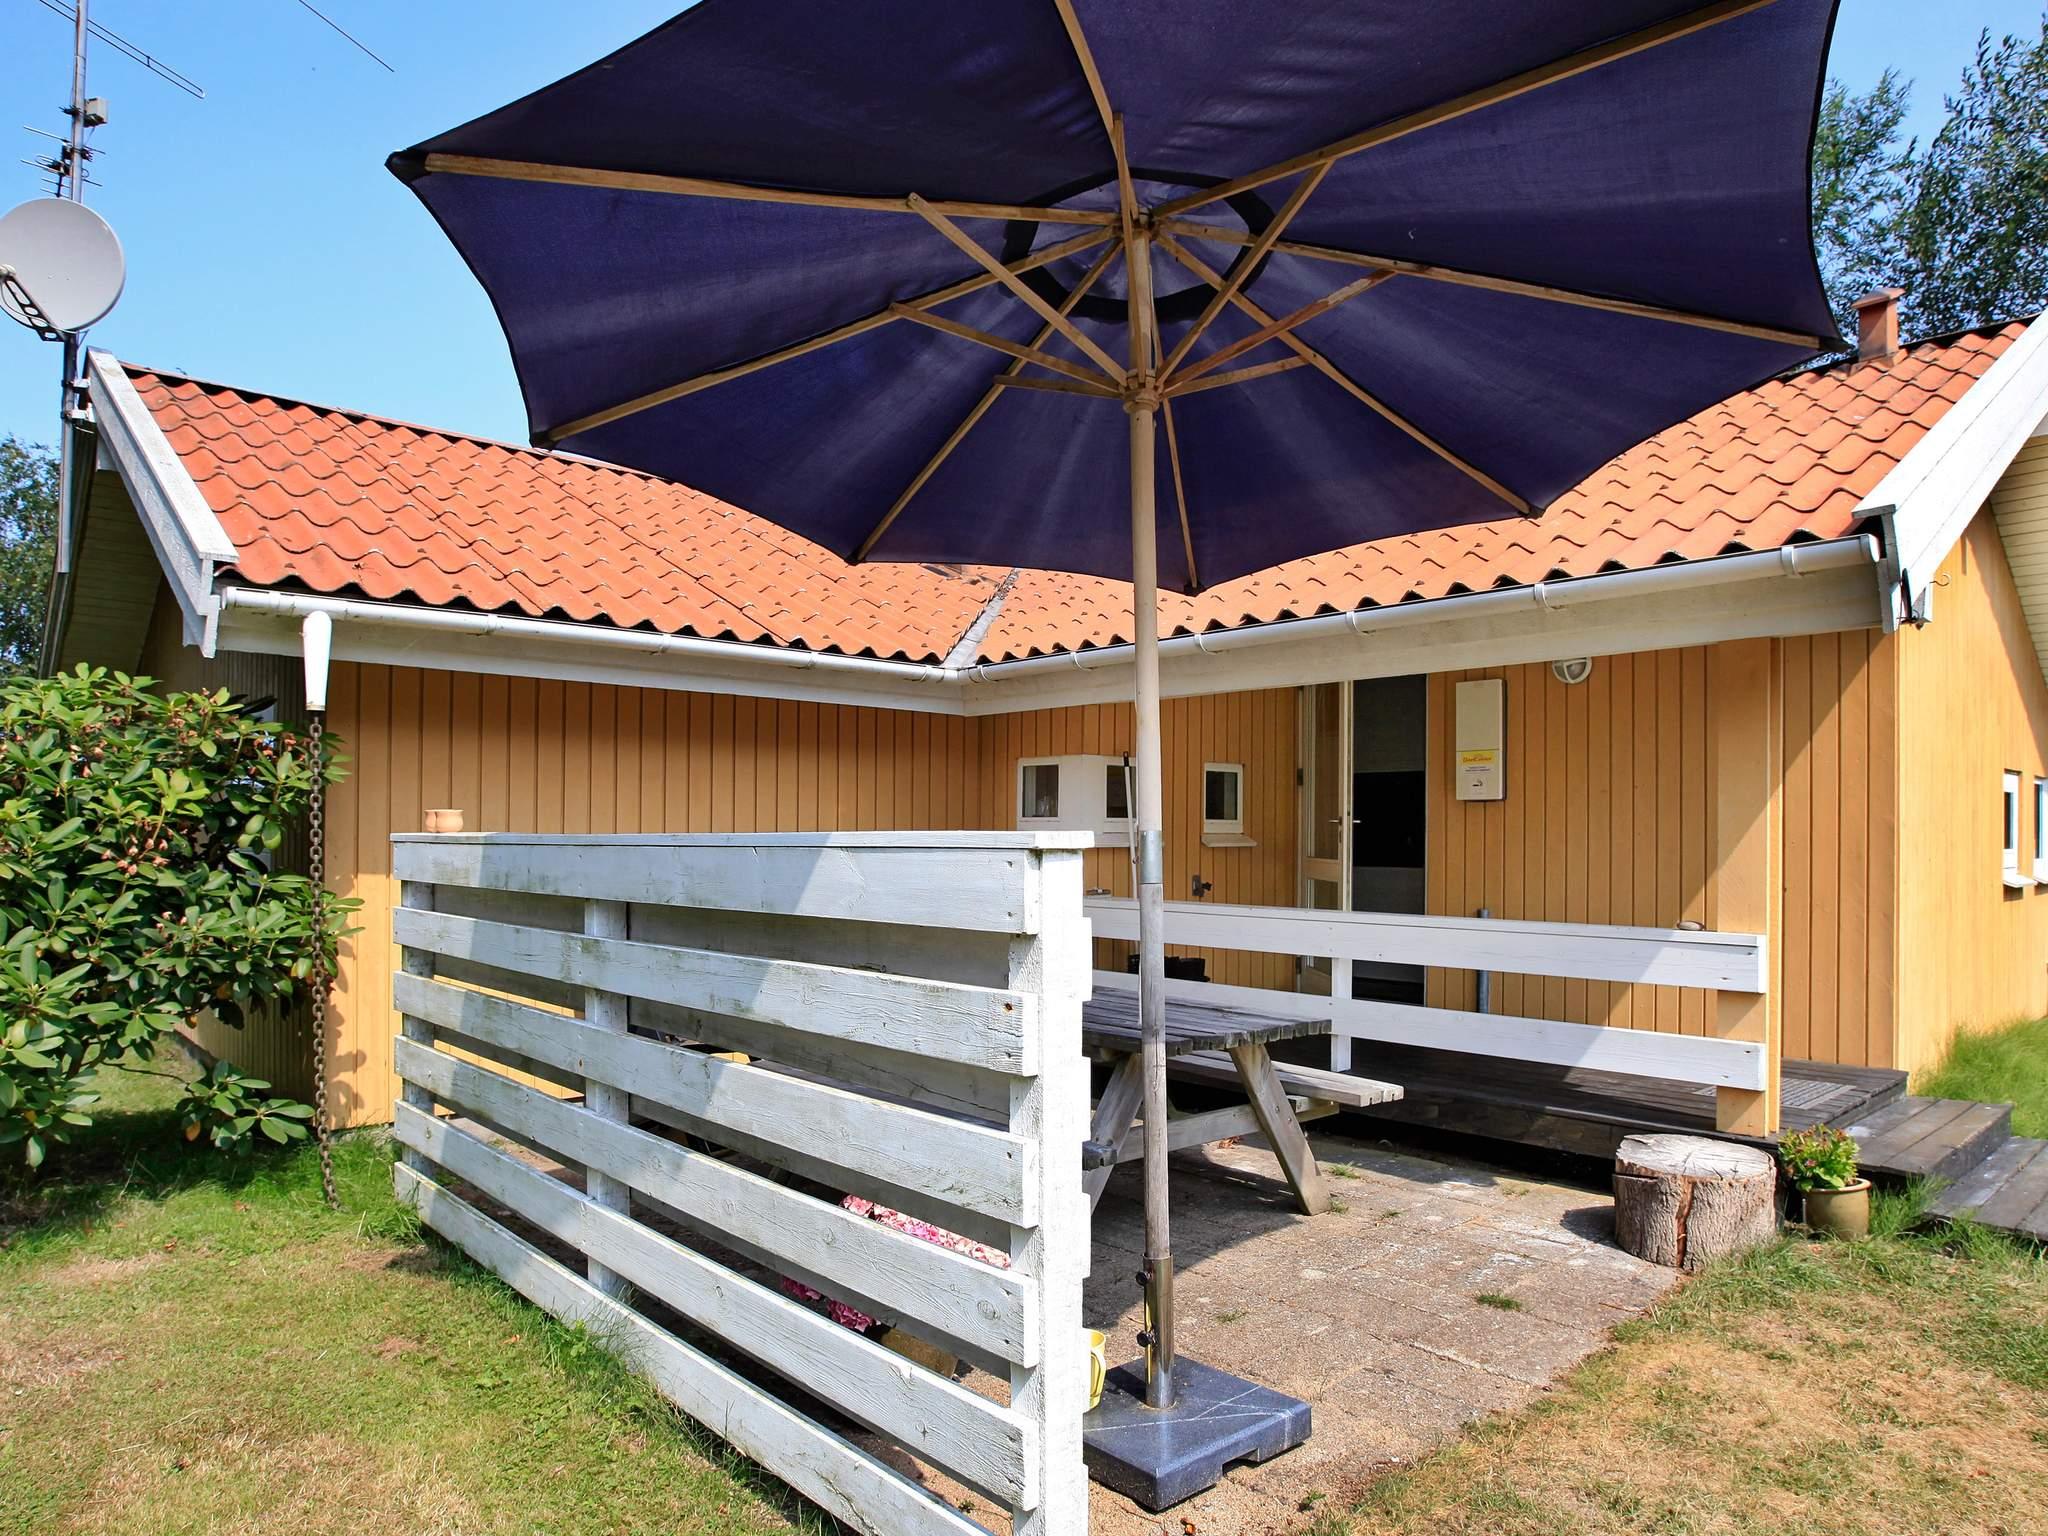 Ferienhaus Ristinge (125632), Ristinge, , Langeland, Dänemark, Bild 37